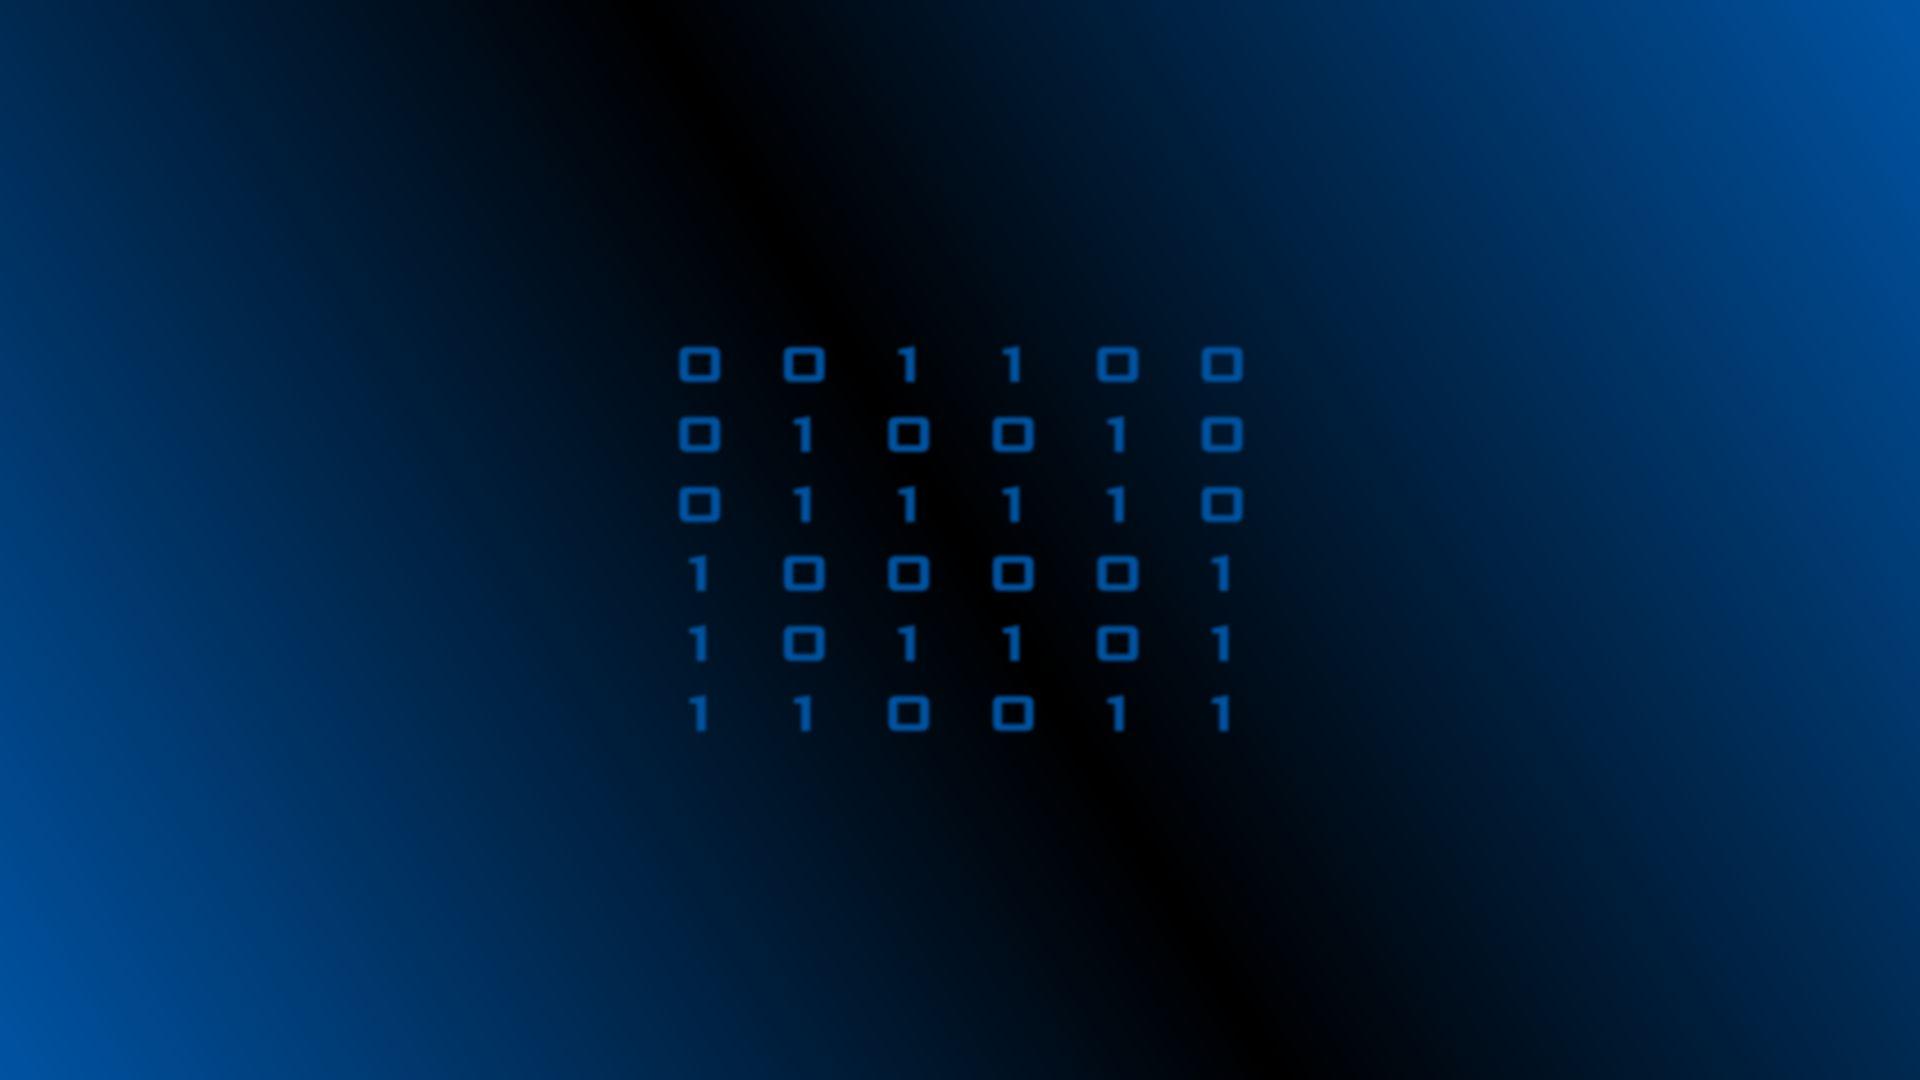 Programming background image